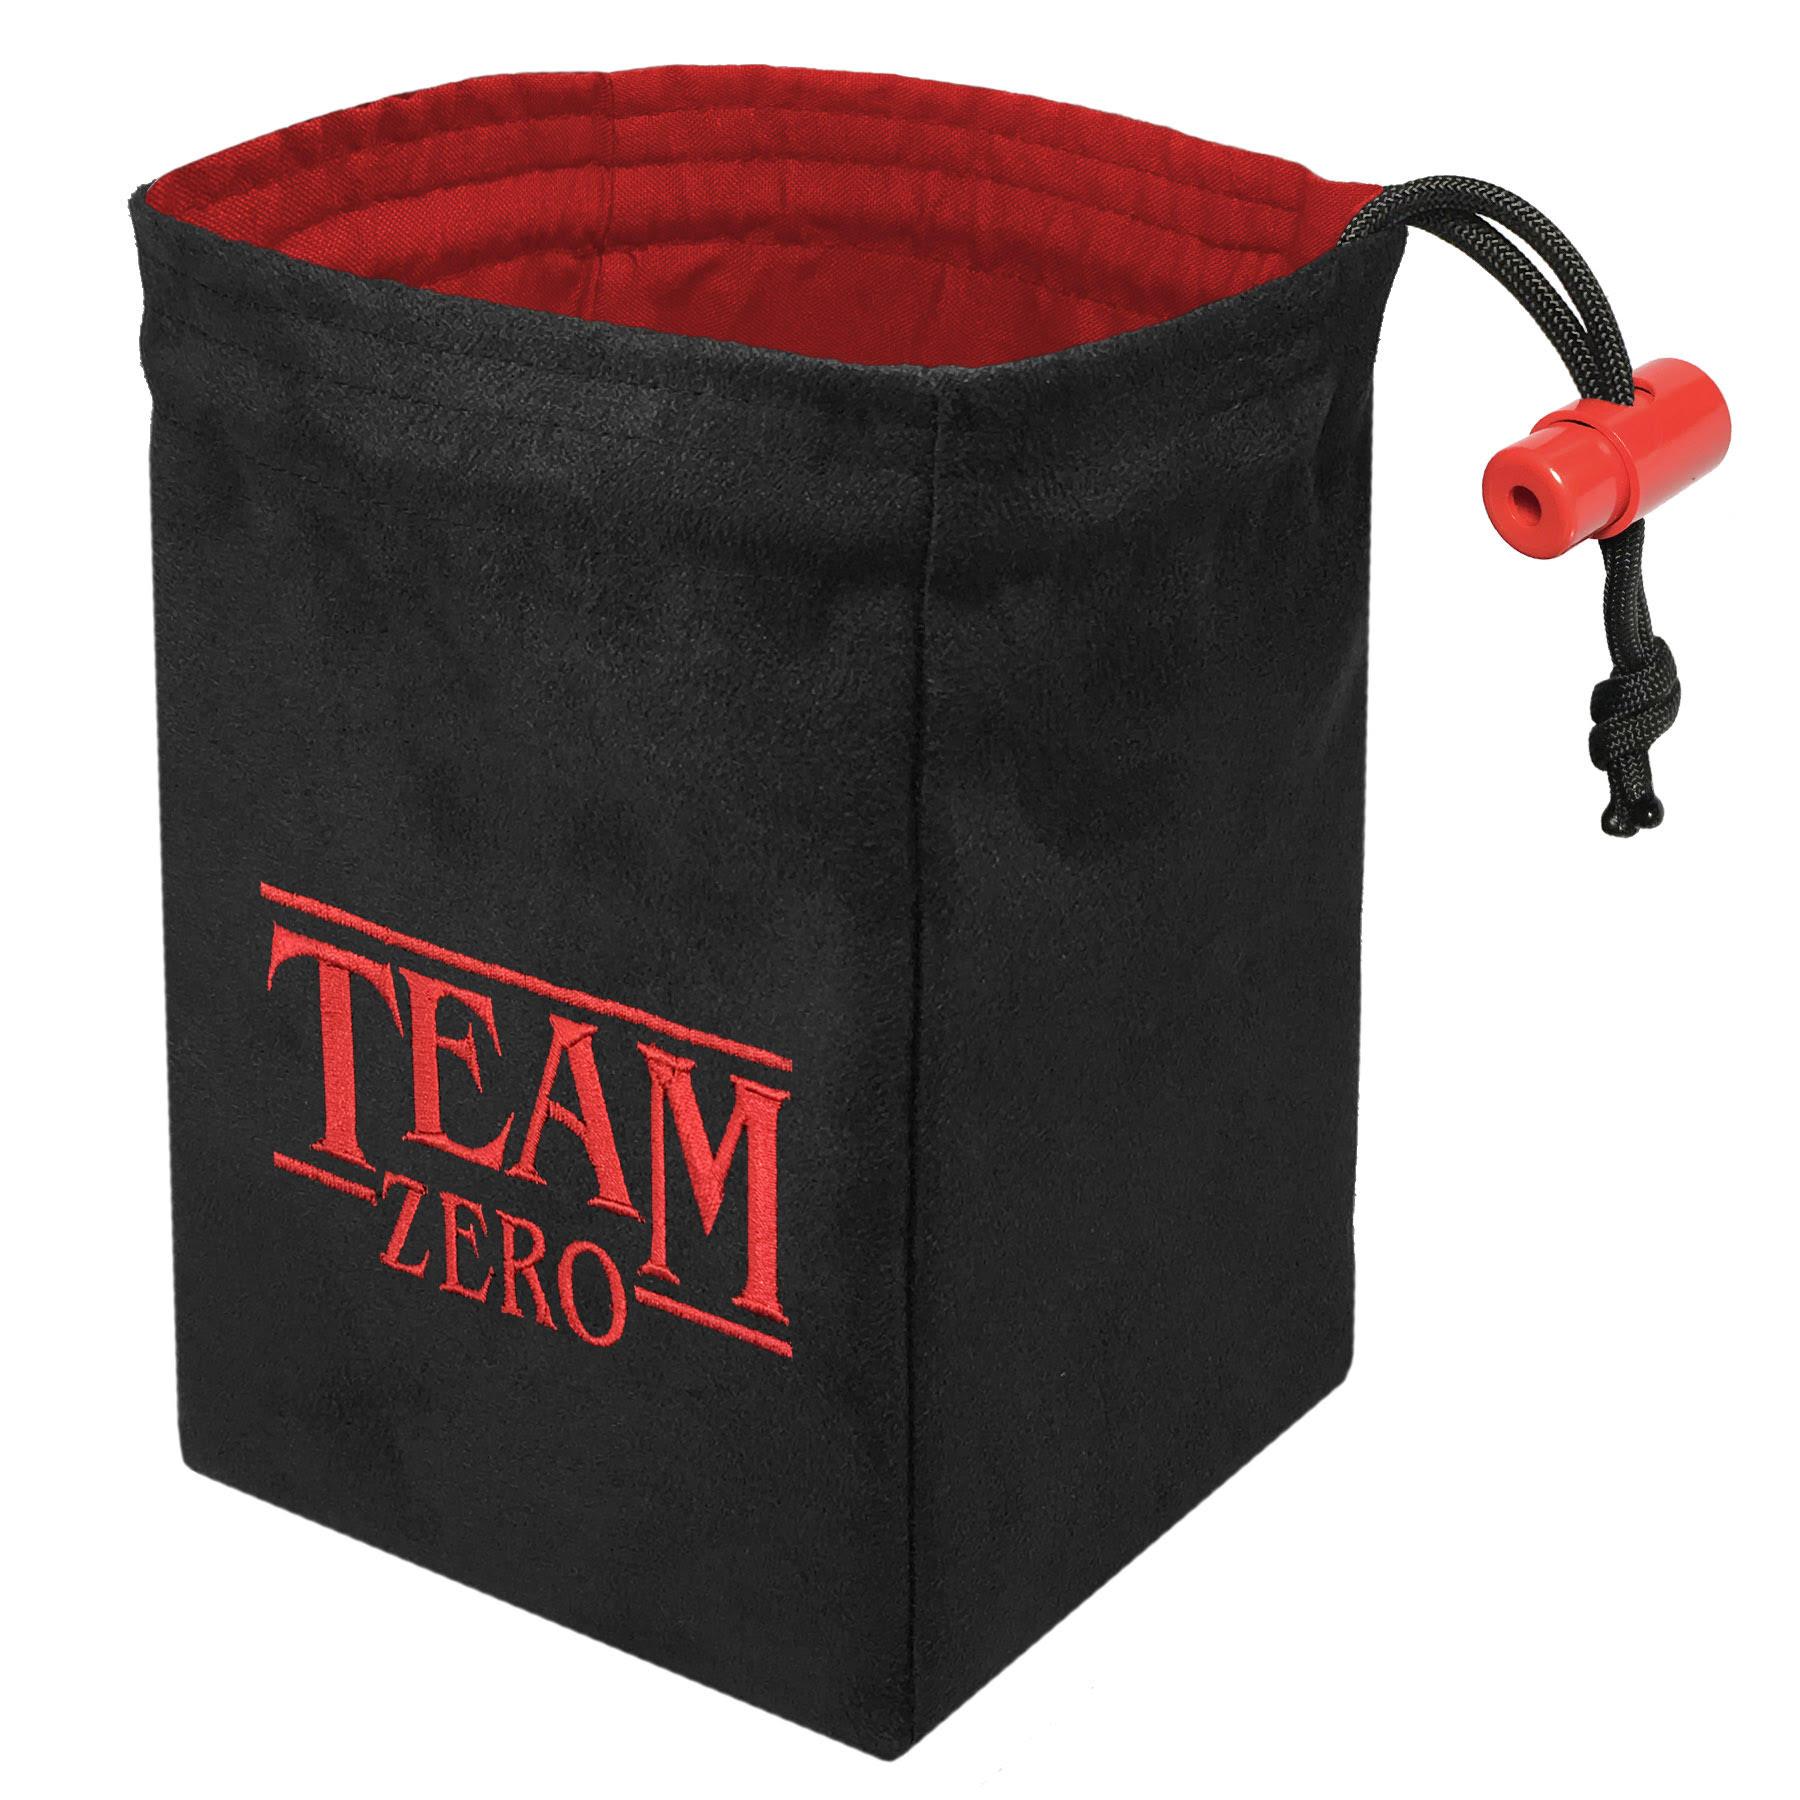 Red King co - Team Zero dice bag